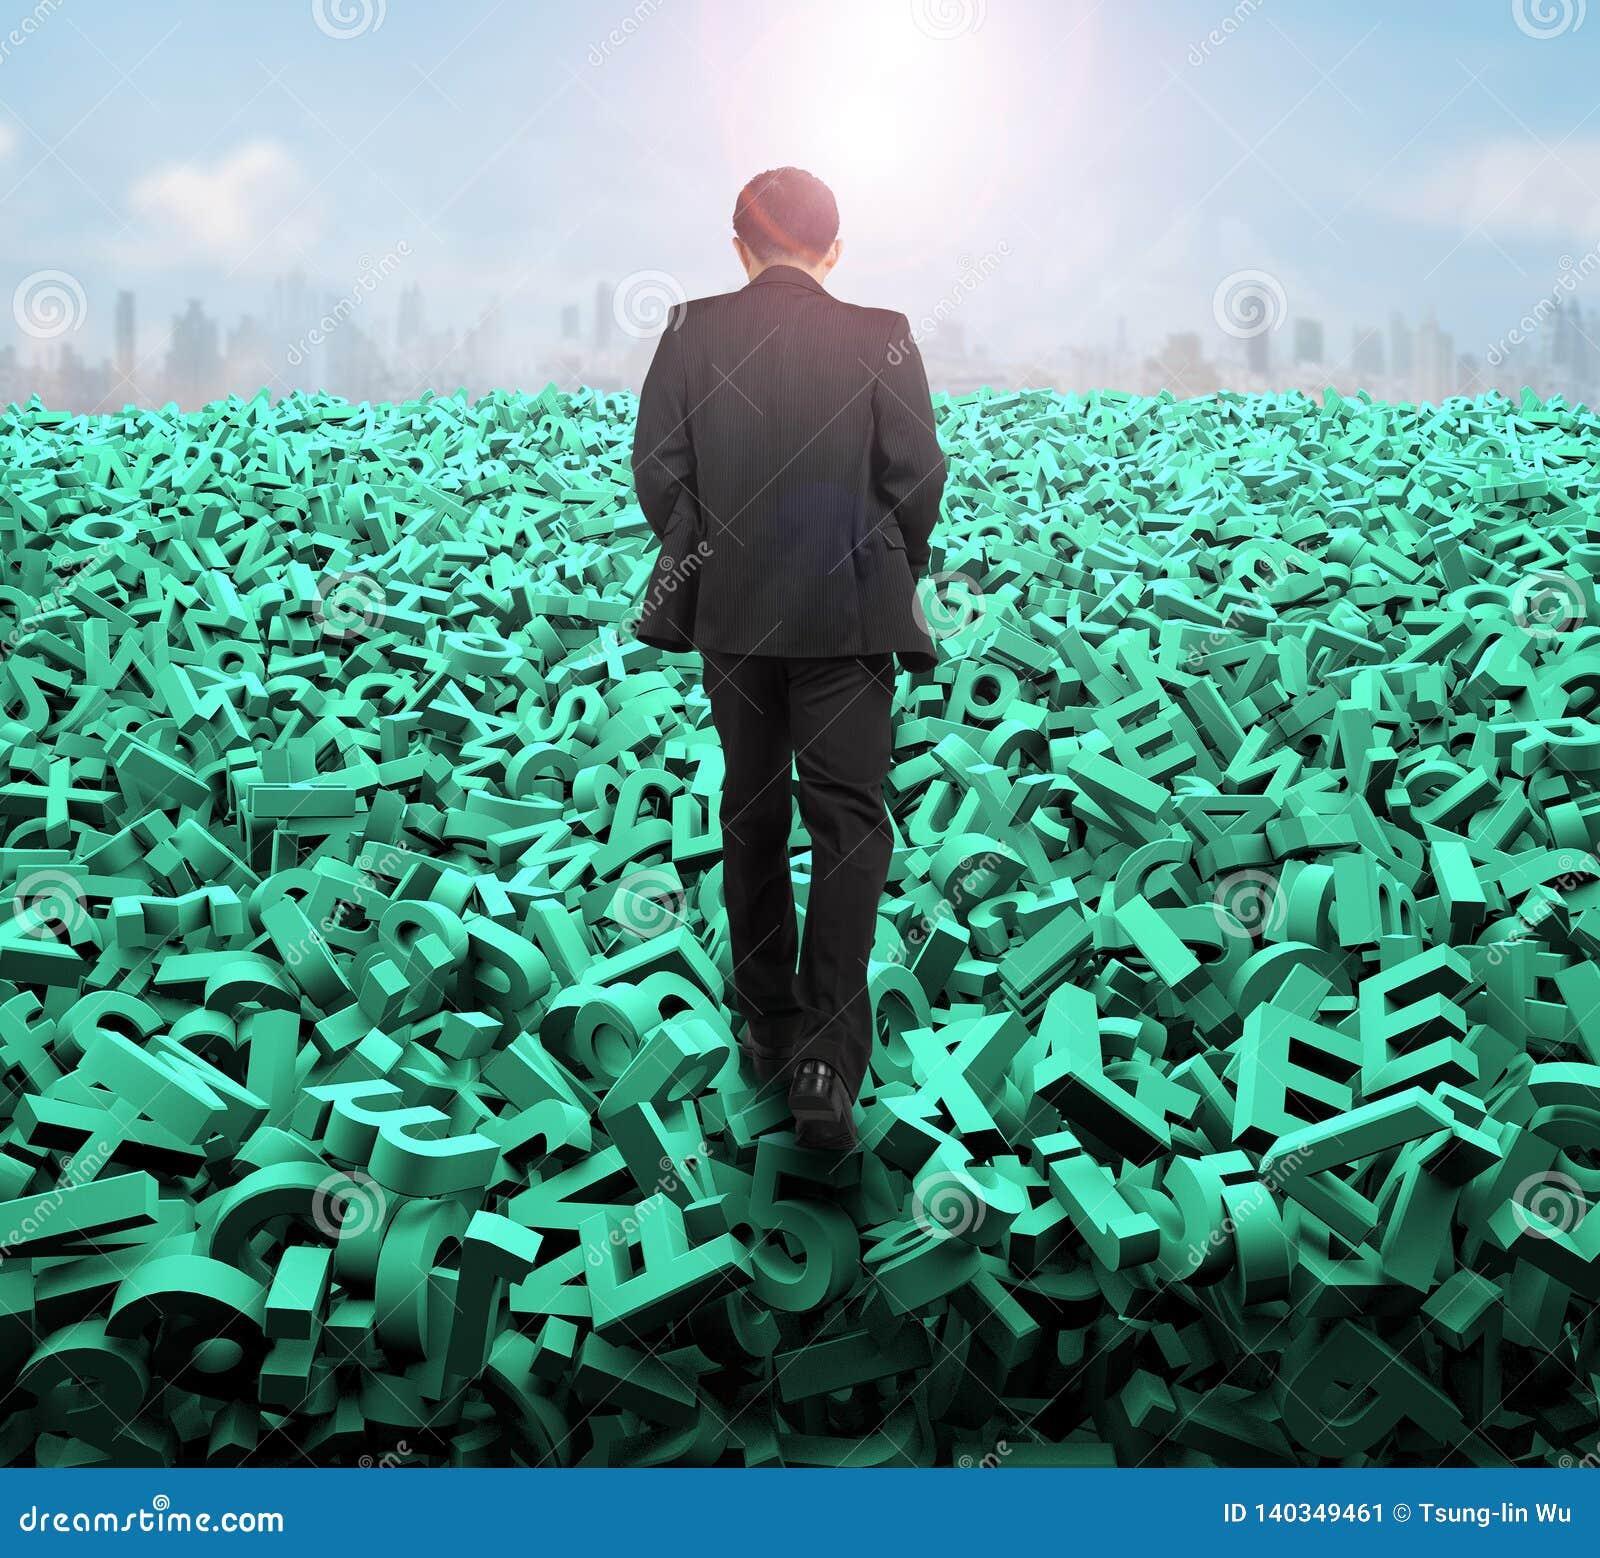 Big data concept, businessman walking on huge green characters